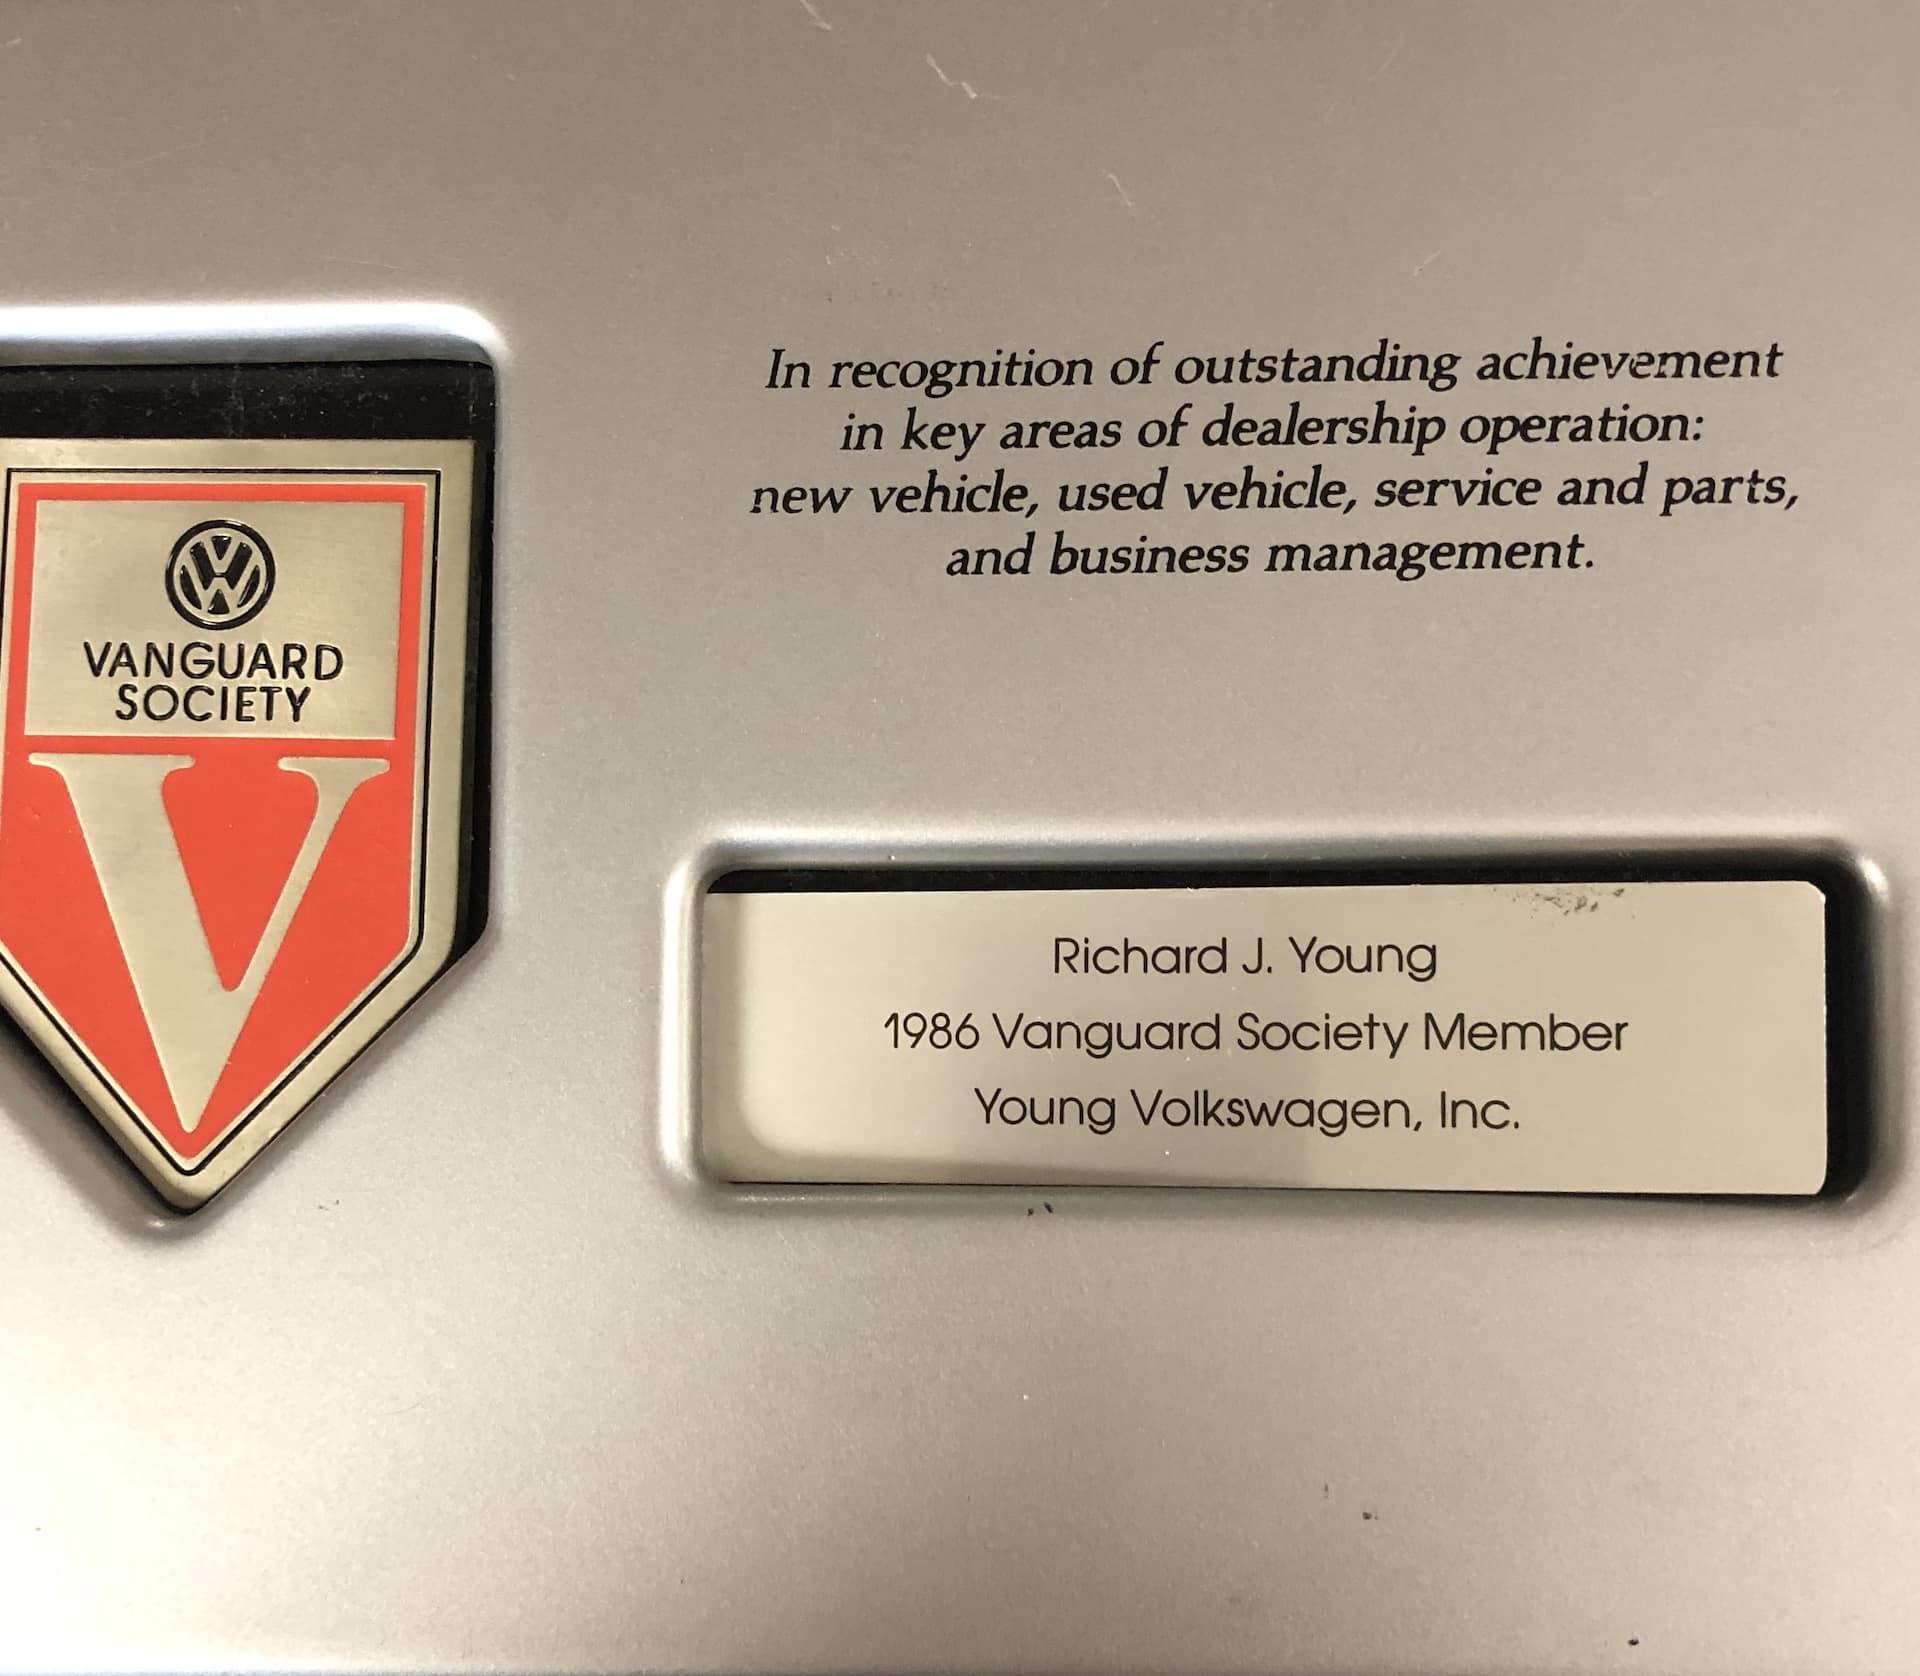 Vanguard Society